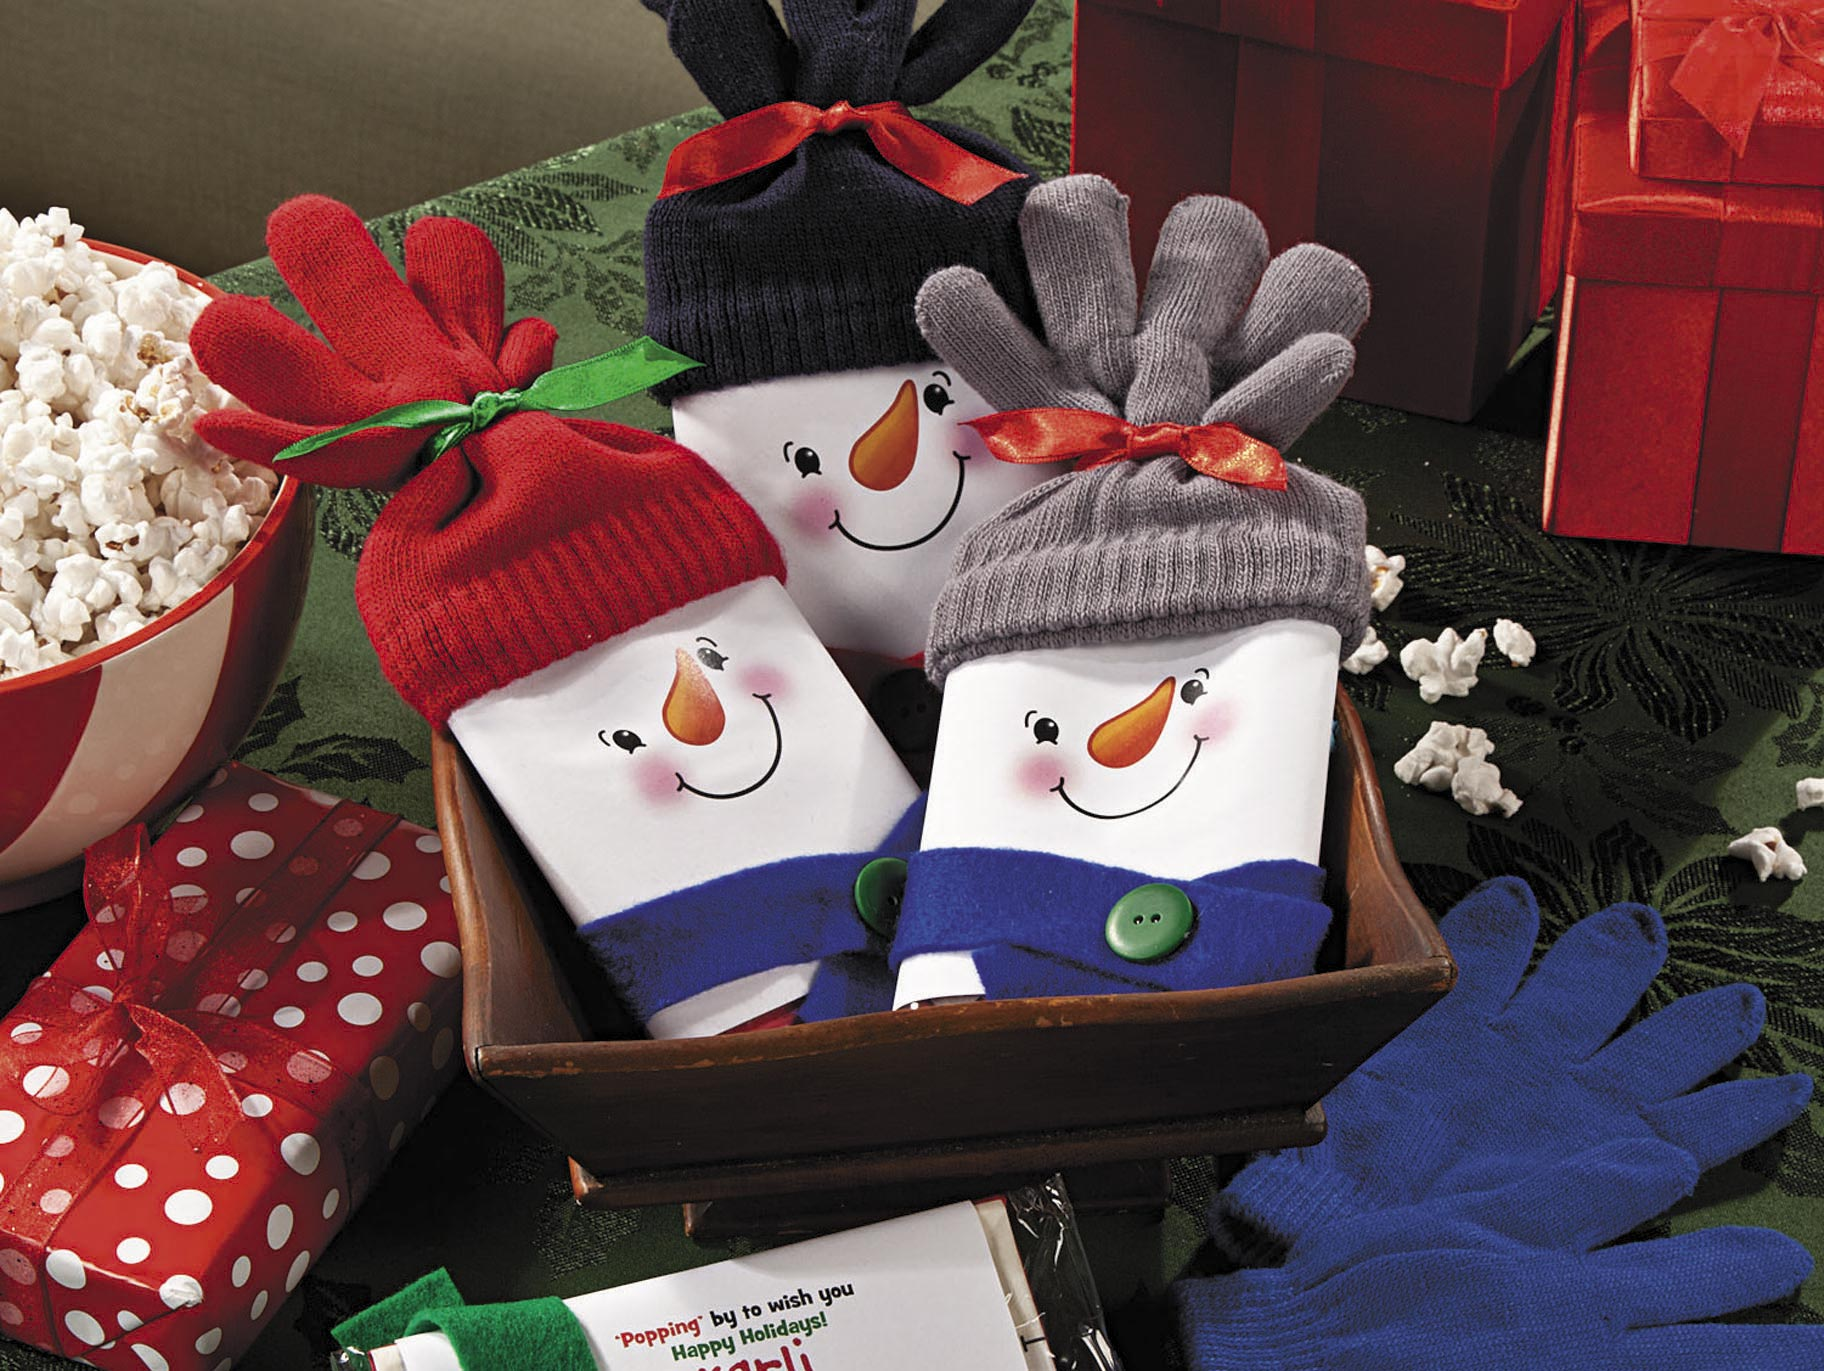 Snowman Popcorn Christmas Gift Idea